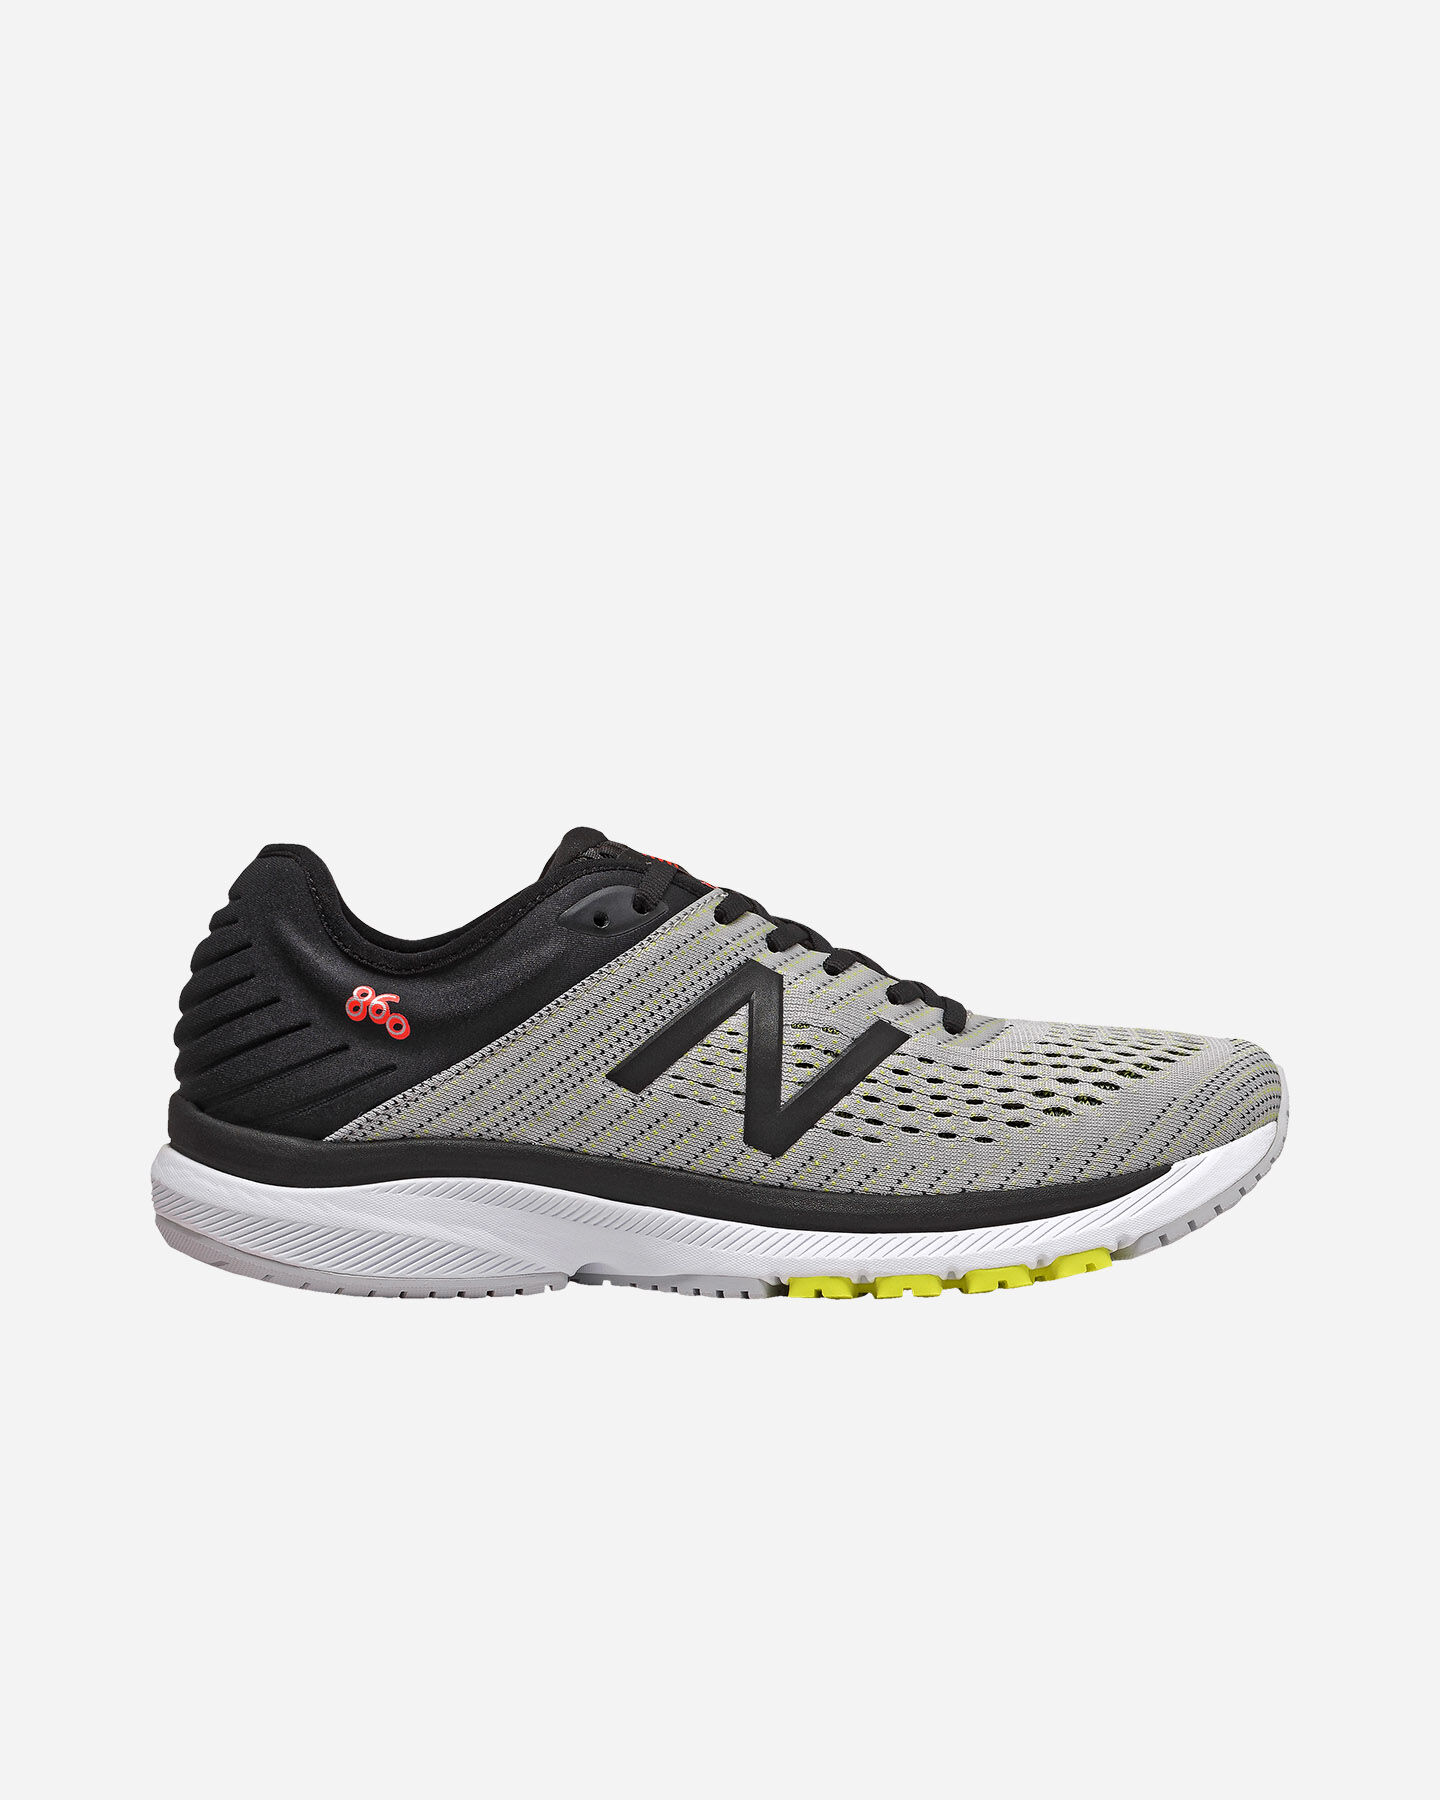 Scarpe Running New Balance 860 V10 M NBM860D10 | Cisalfa Sport